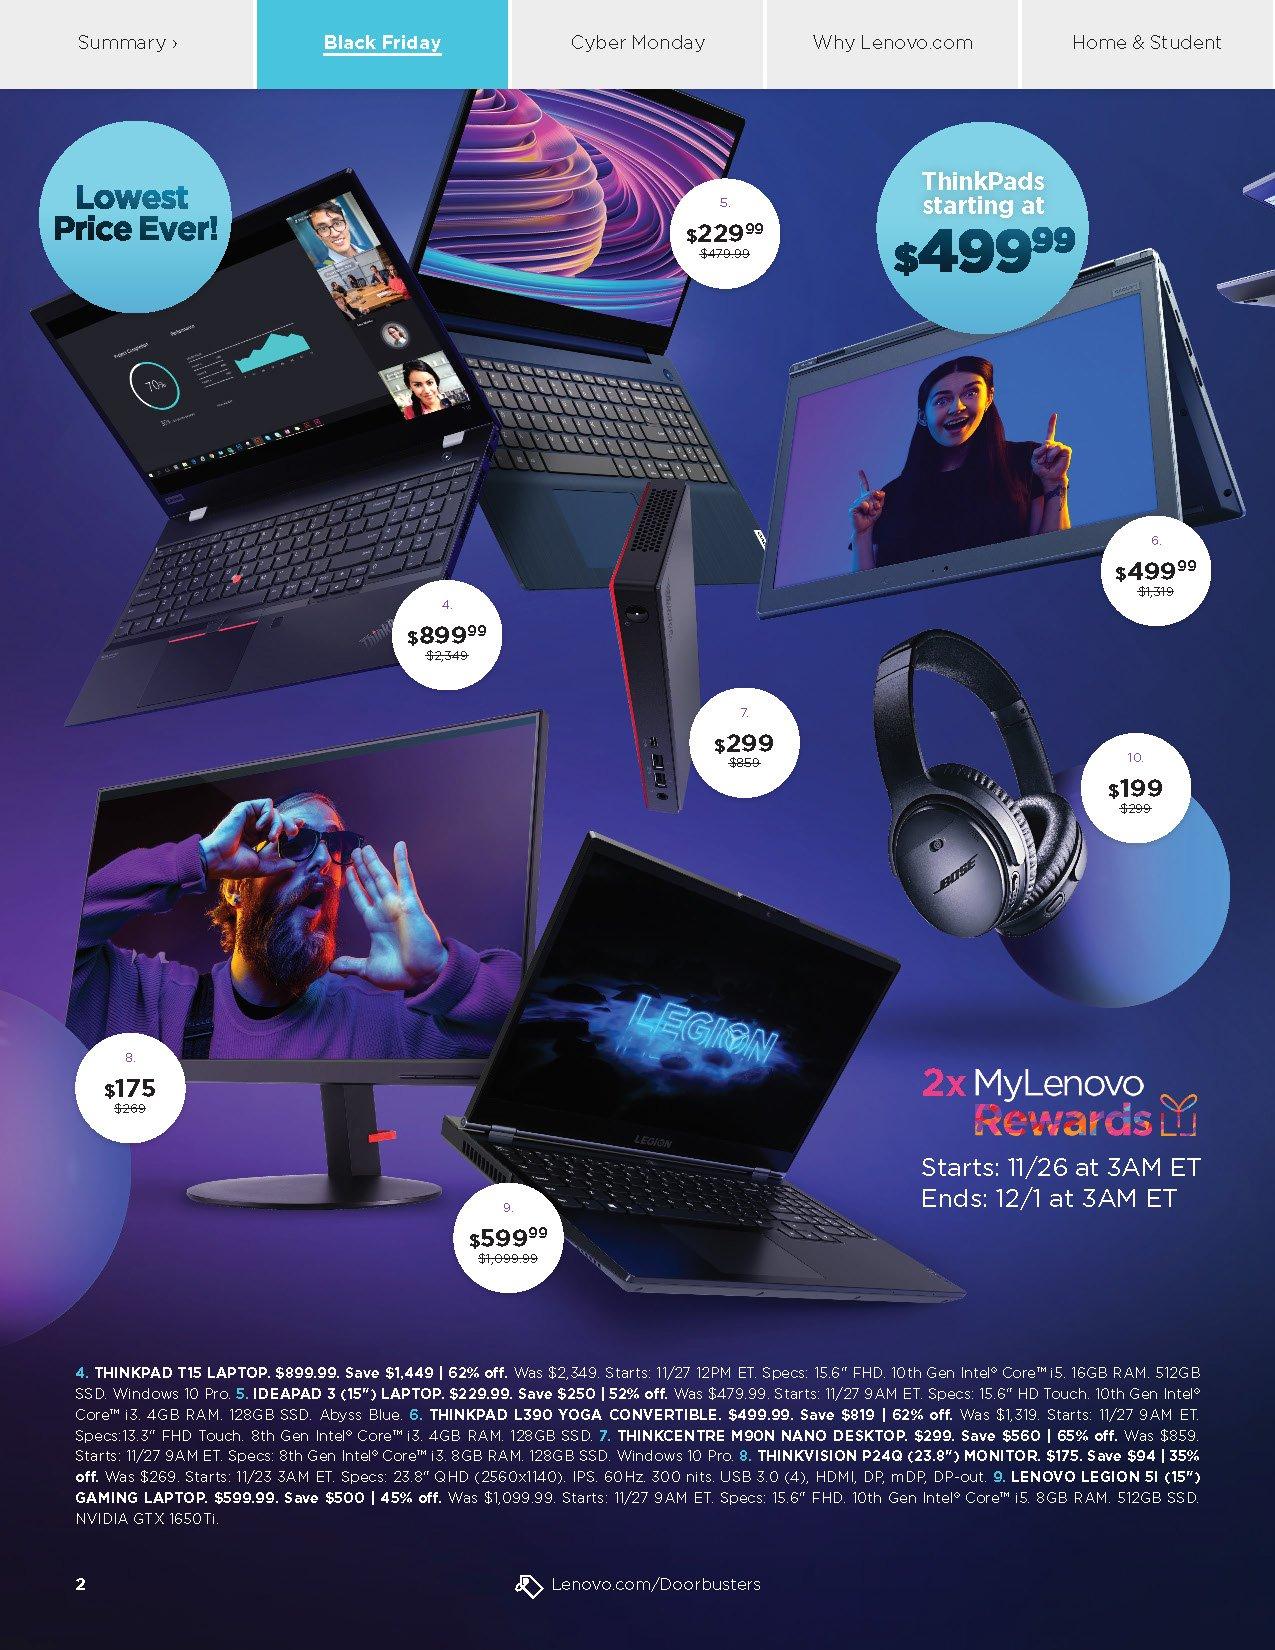 Lenovo Black Friday 2020 Page 2